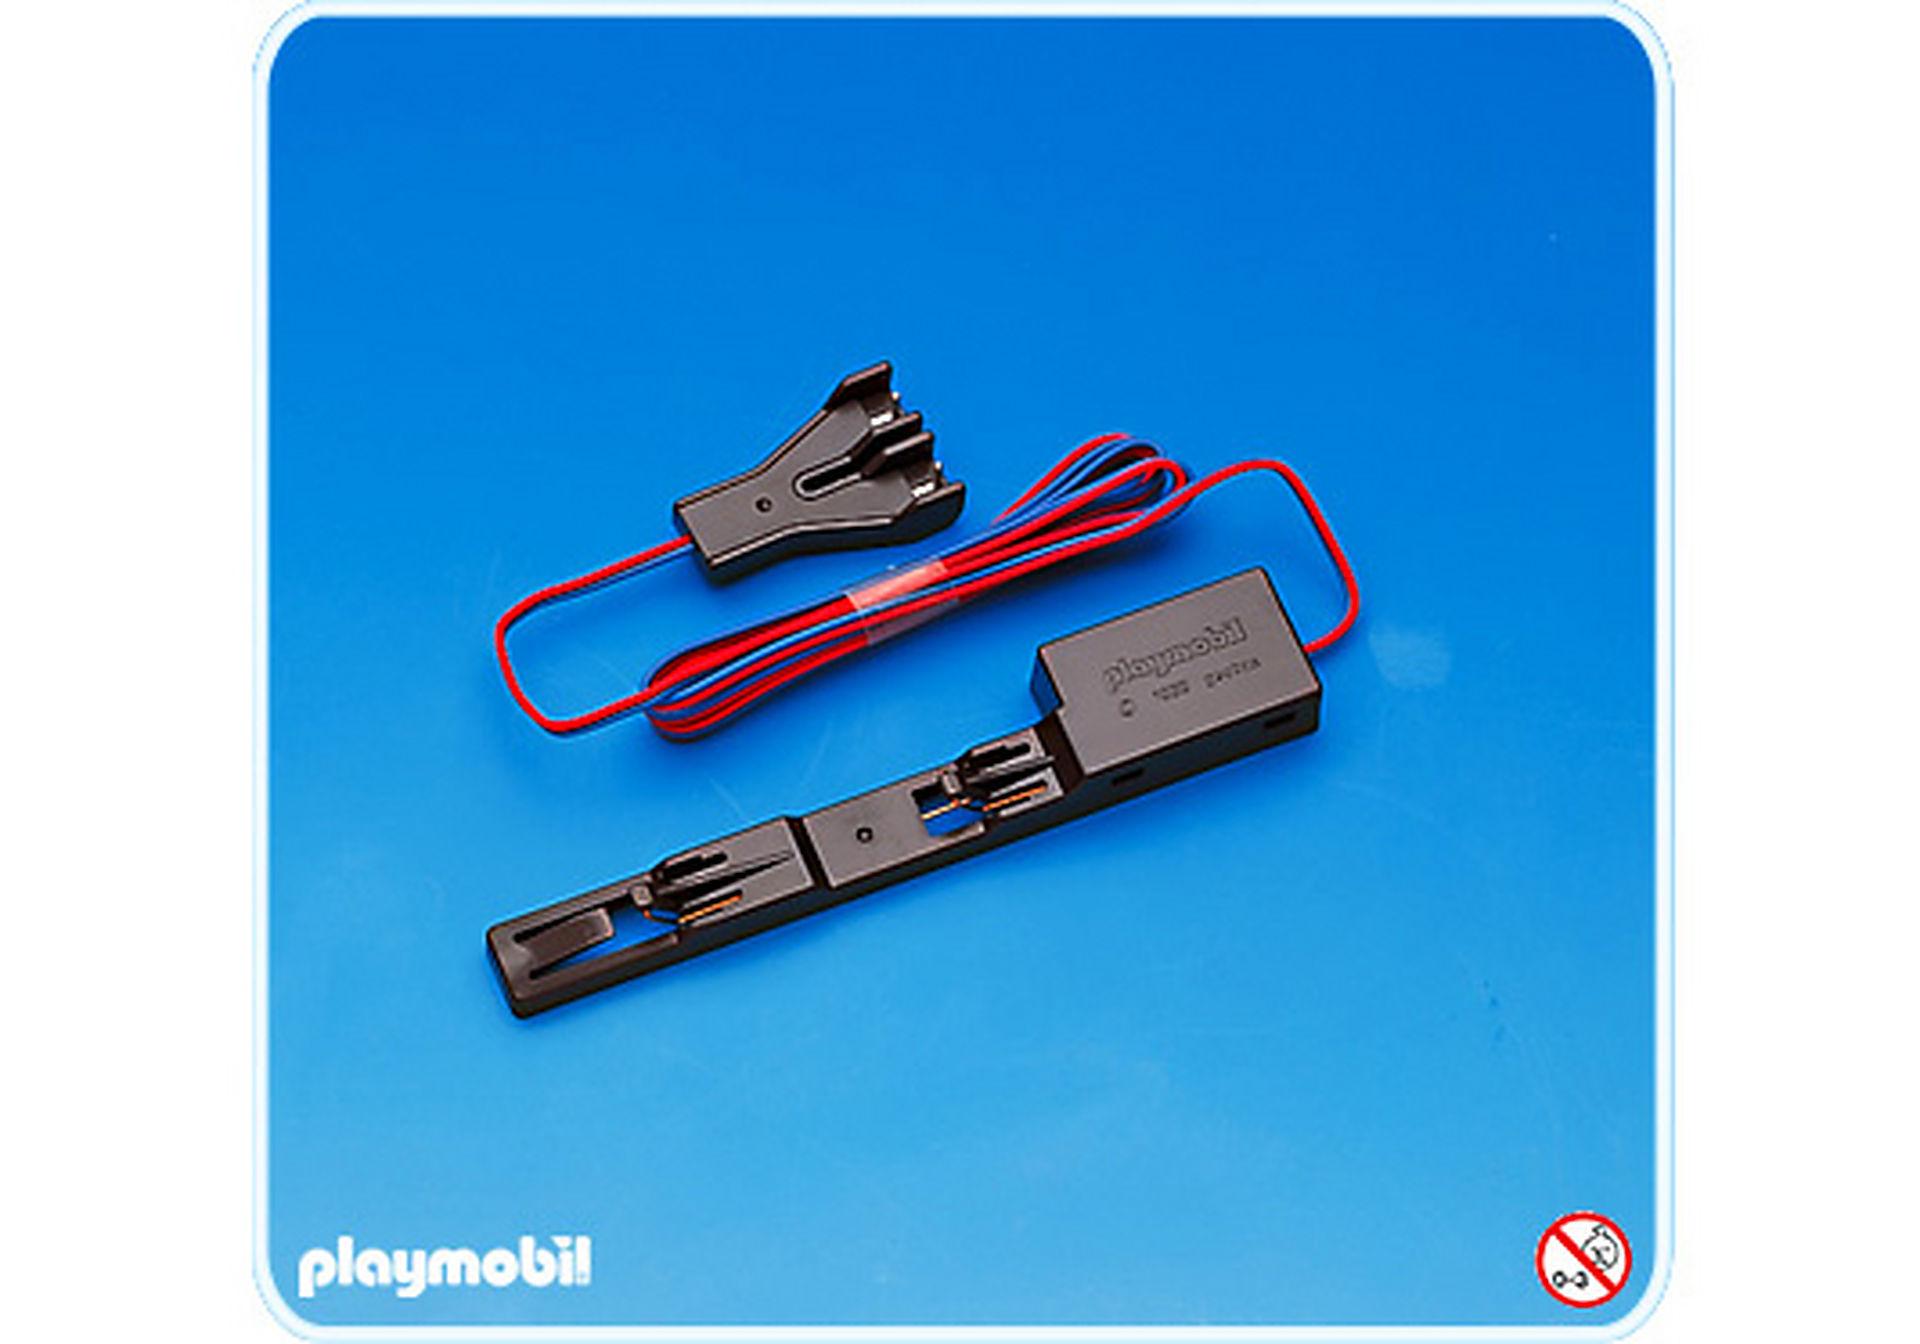 http://media.playmobil.com/i/playmobil/4372-A_product_detail/Anschlusskabel/ Stecker